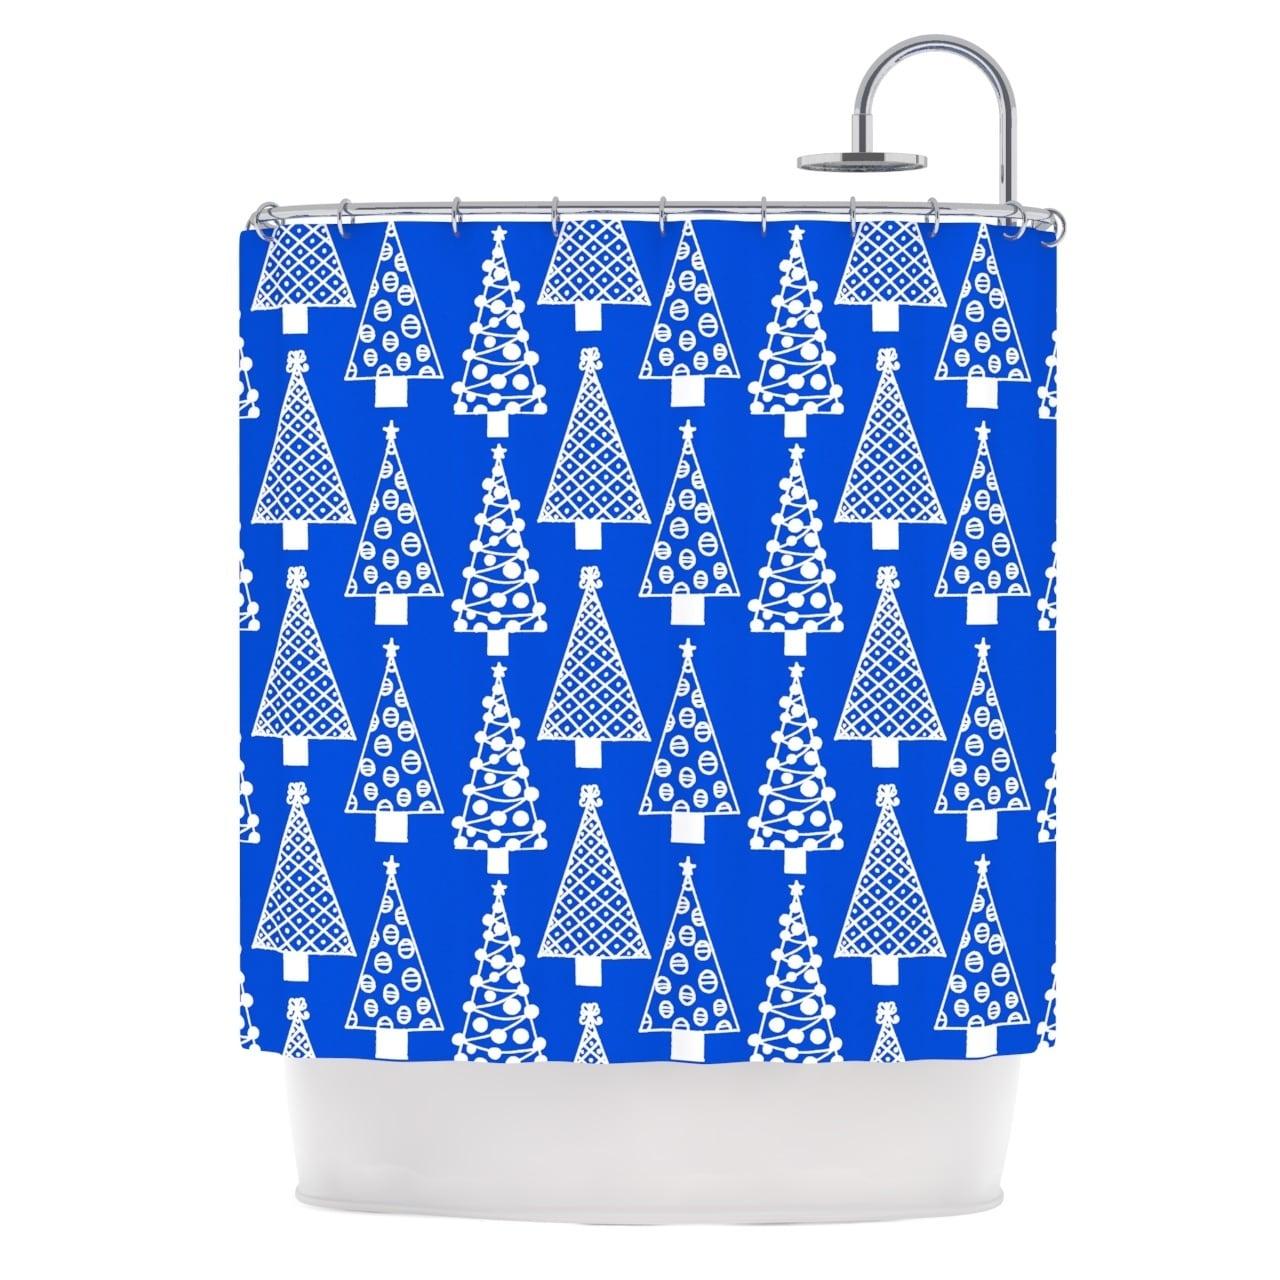 Shop KESS InHouse Emine Ortega Jolly Trees Blue Royal Shower Curtain 69x70